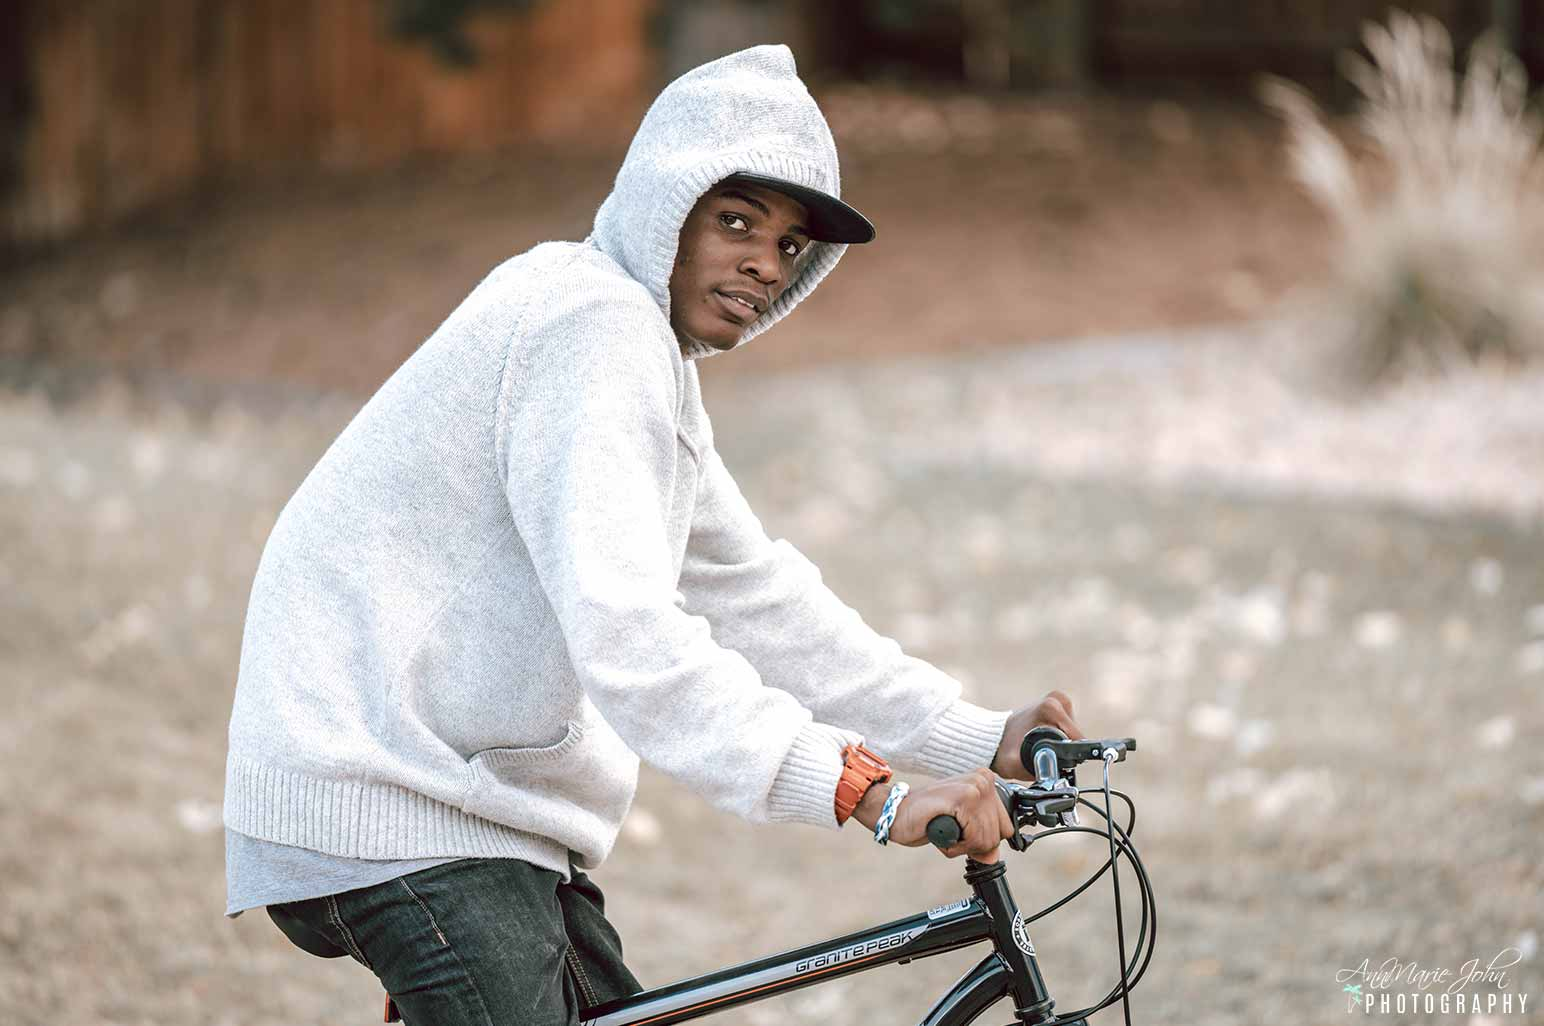 Teenager on Bike